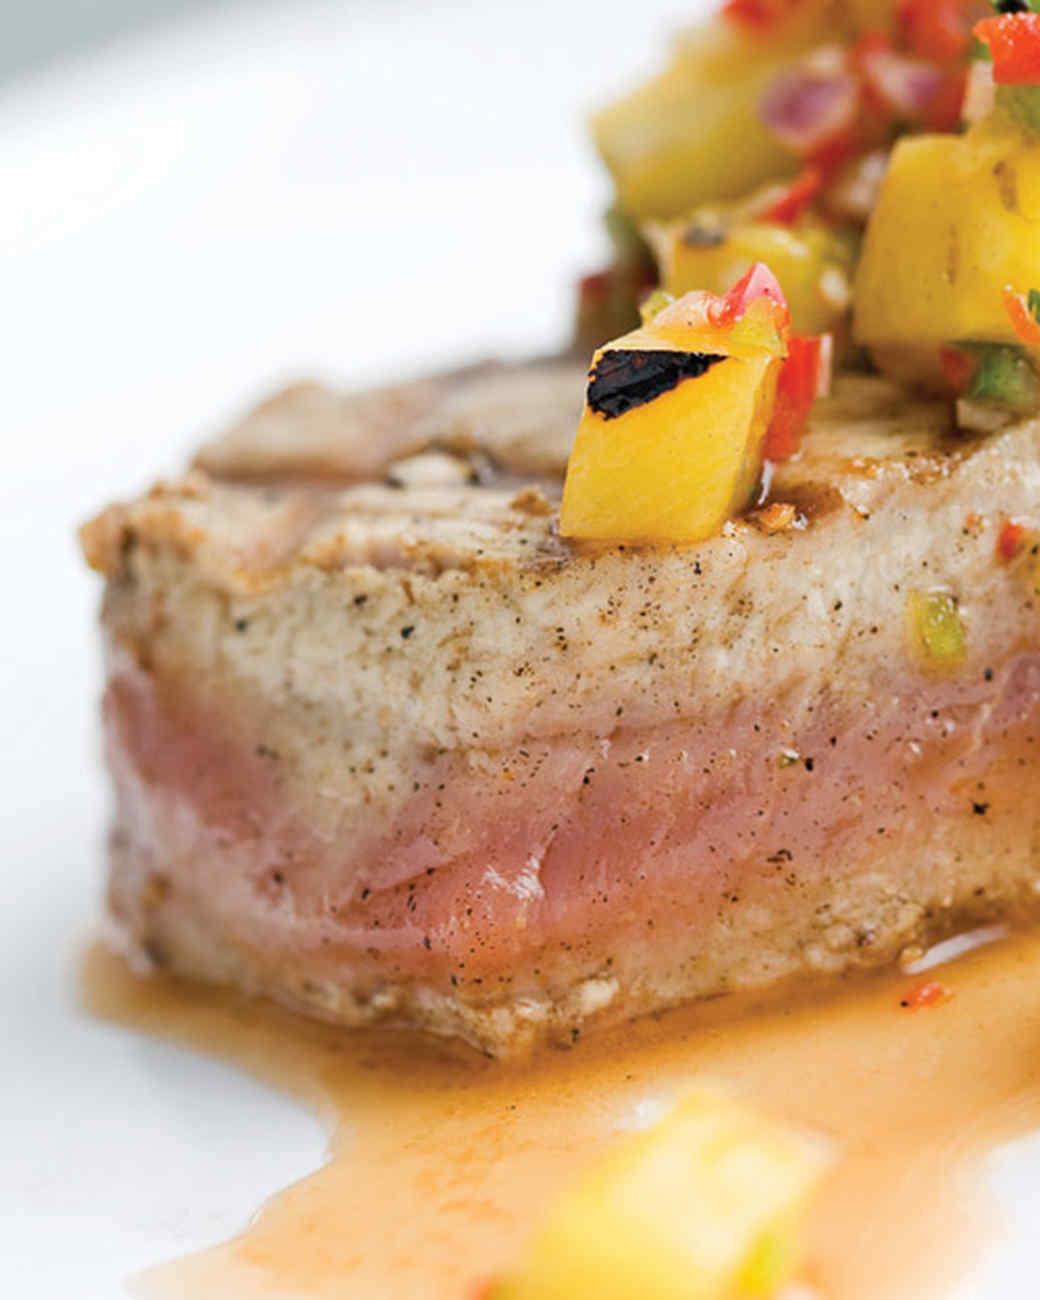 Yellowfin Tuna with Grilled Pineapple Salsa